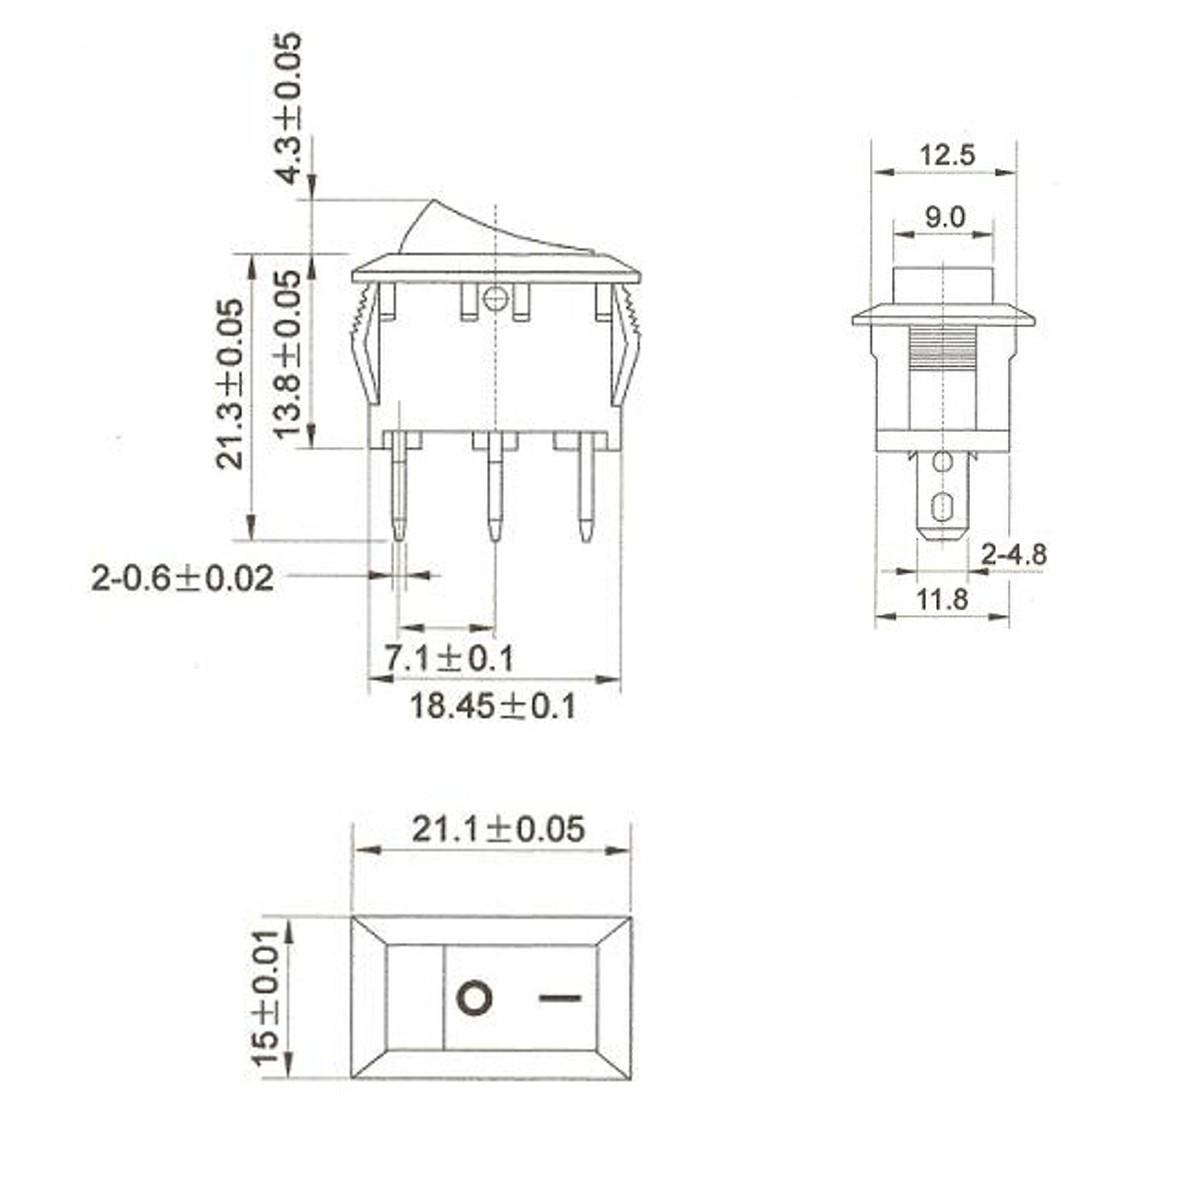 12v spst 3 pin large rectangle rocker switch led lighted